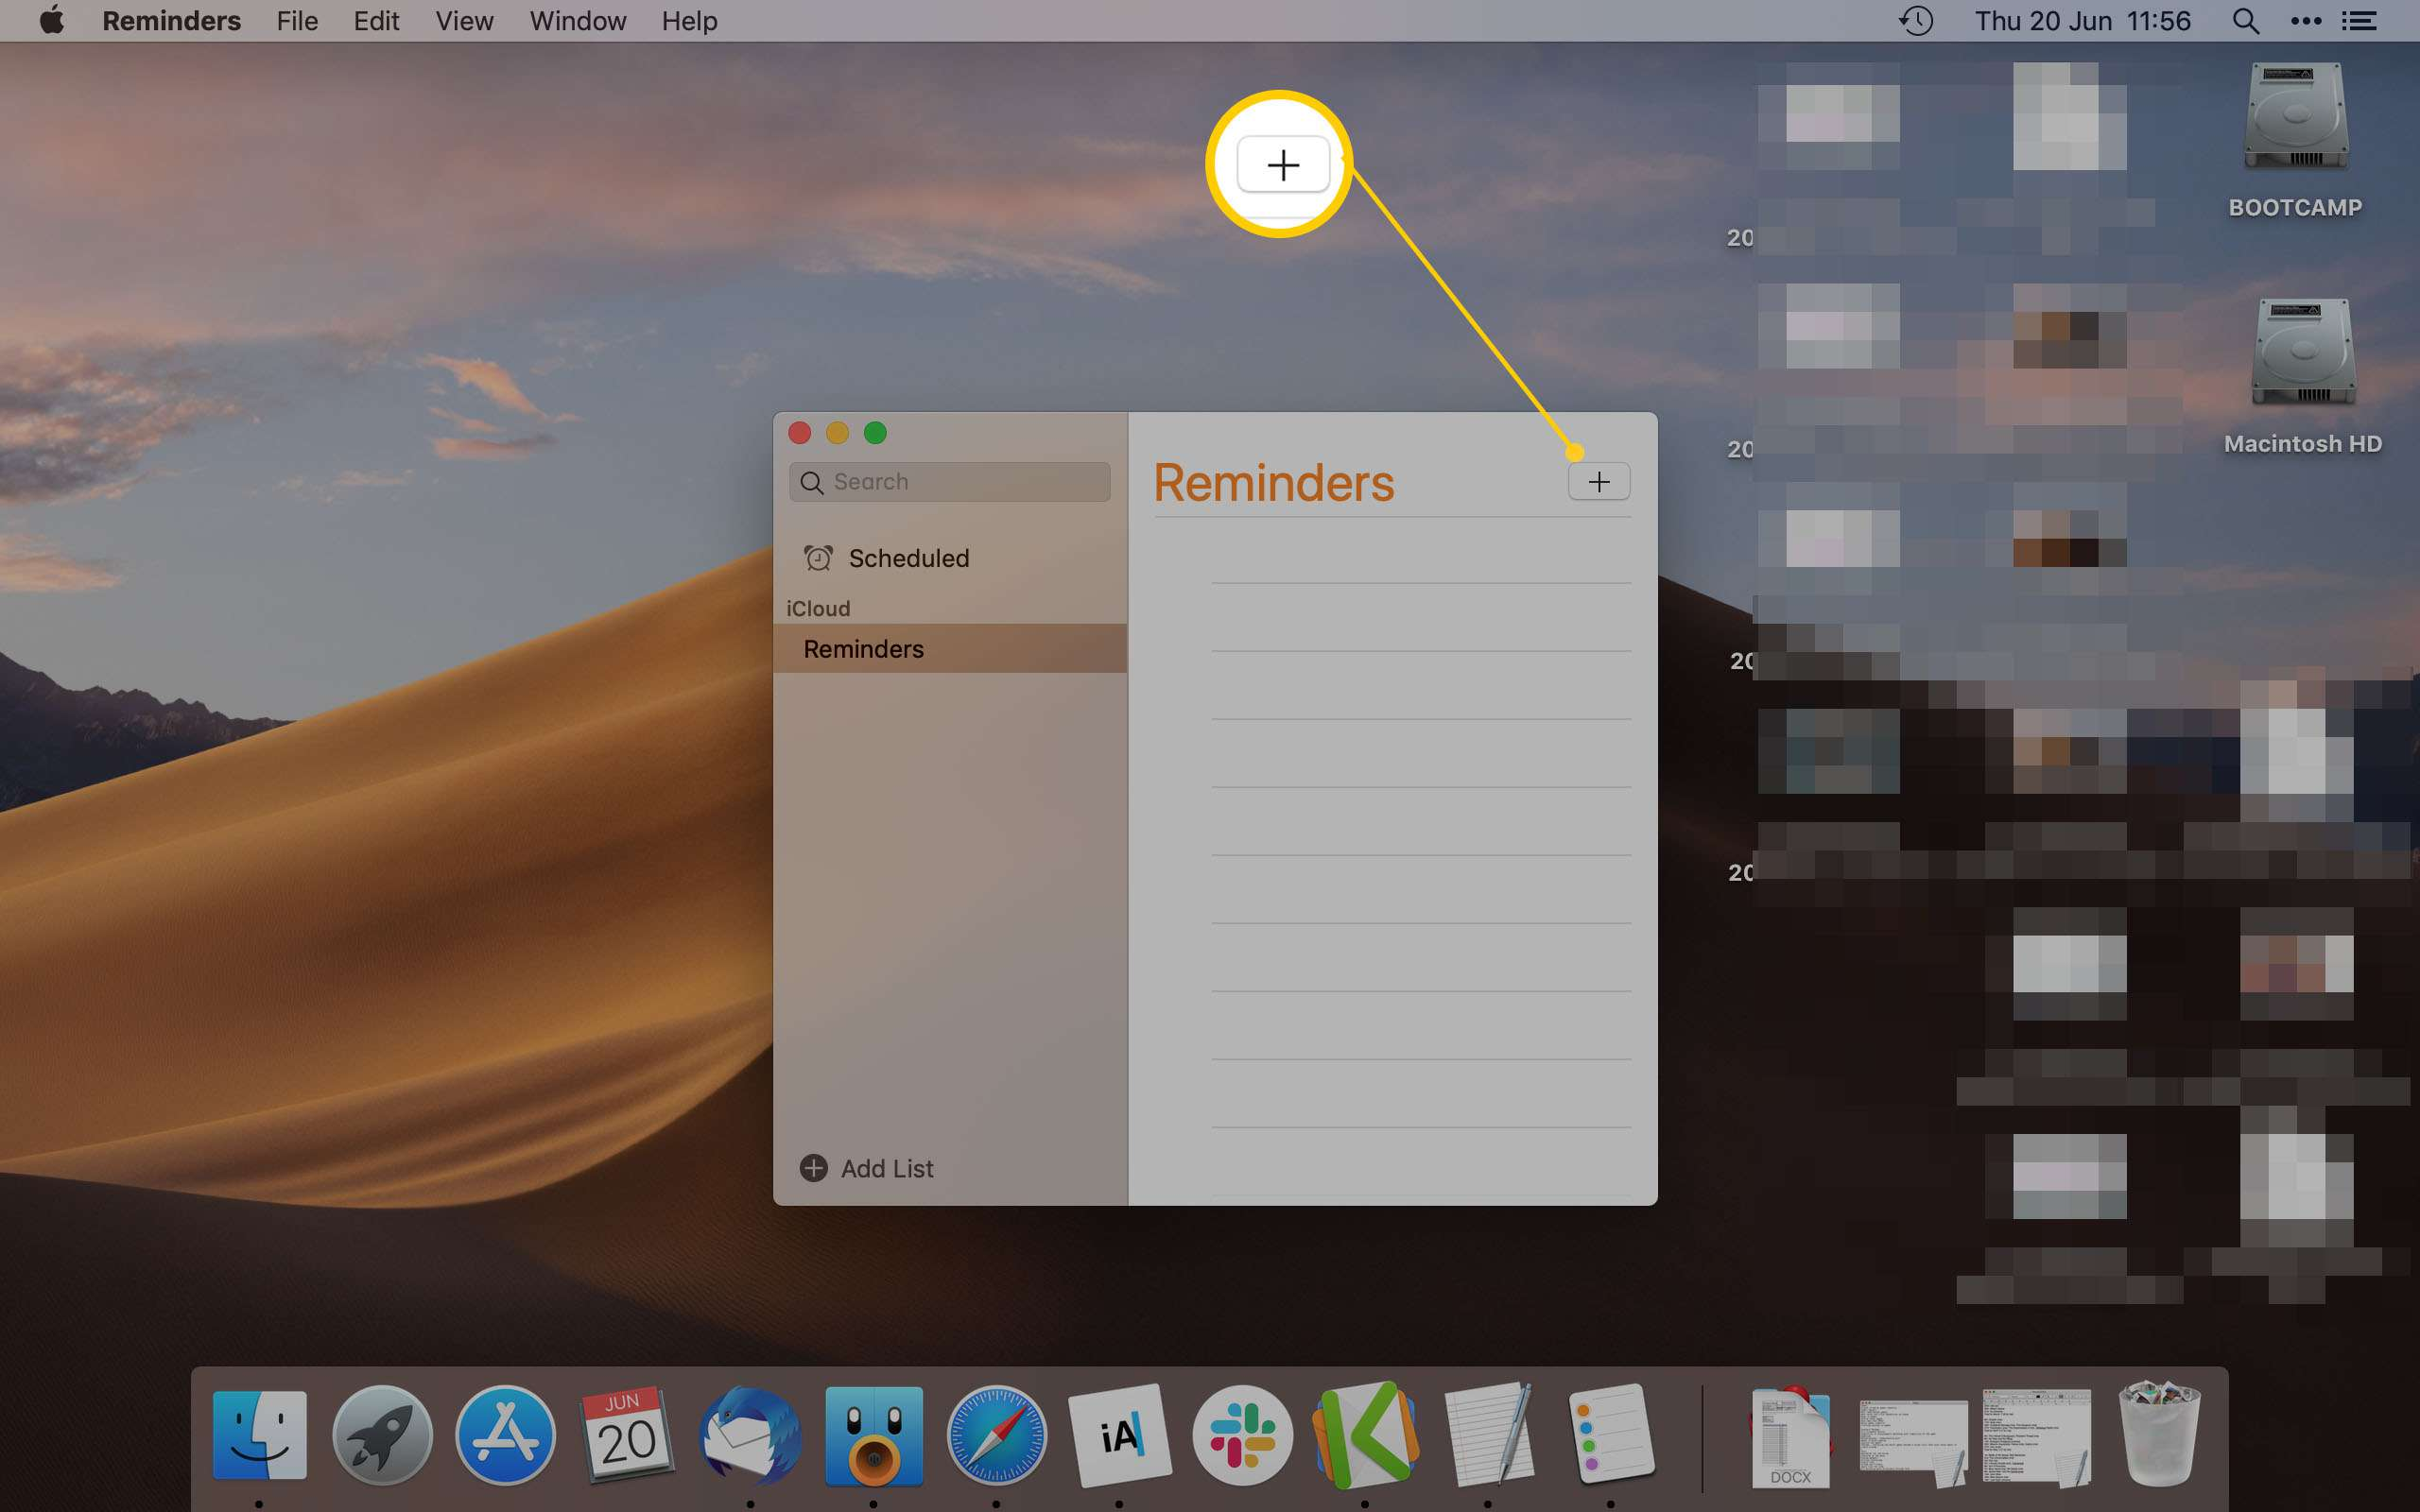 Mac Reminder App Highlighting the Add Icon